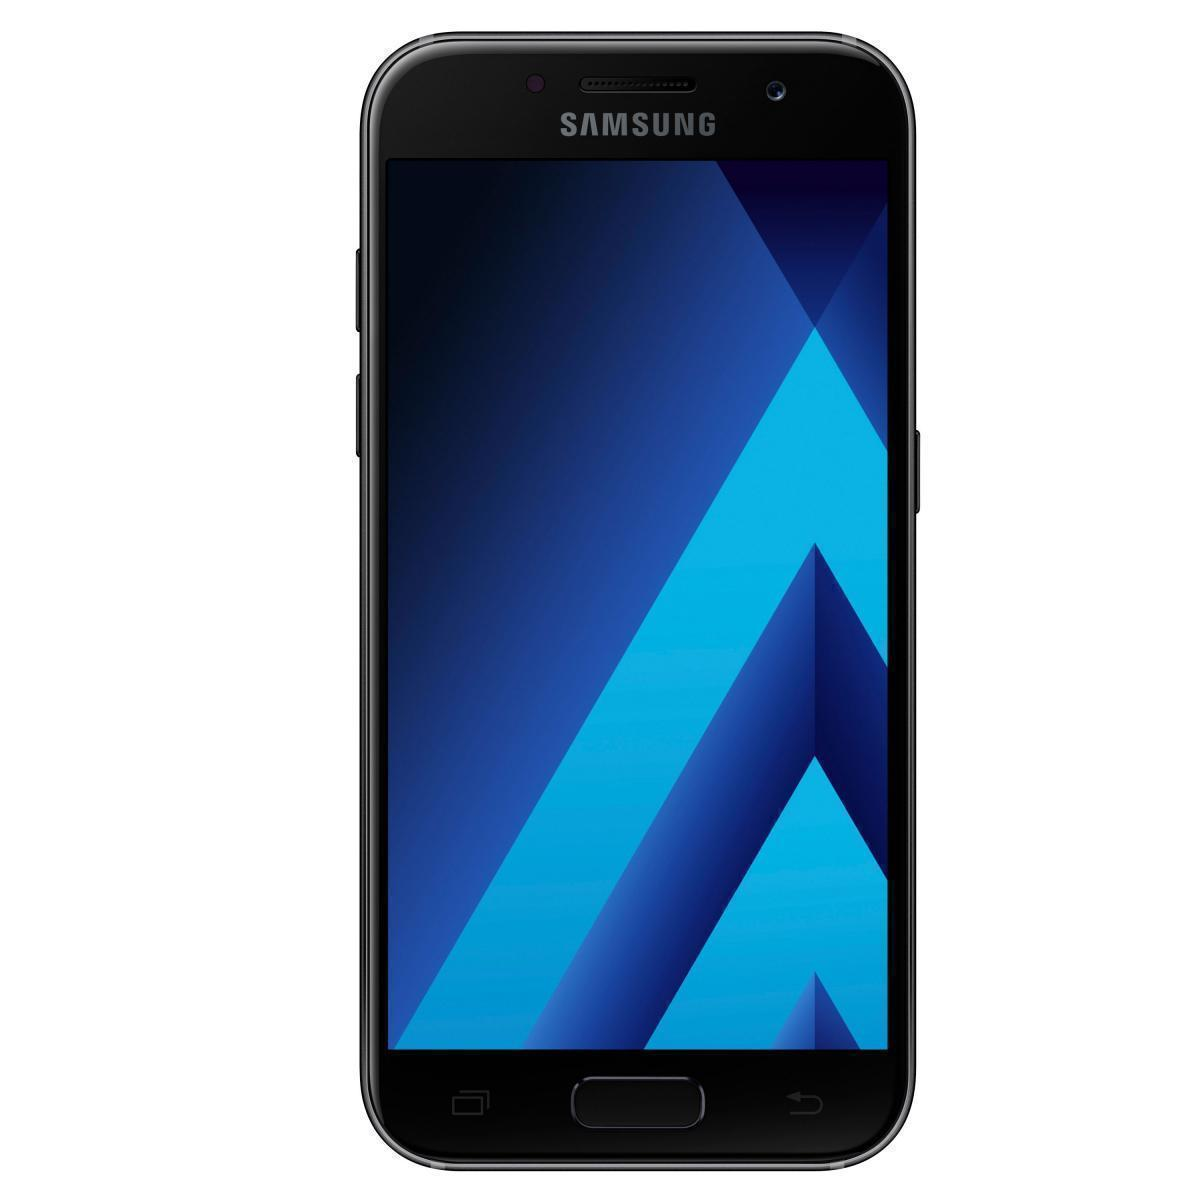 Samsung Galaxy A3 (2017) (SM-A320F/DS) Black (SM-A320FZKDSER)Samsung<br>Samsung Galaxy A3 (2017) (SM-A320F/DS) Black (SM-A320FZKDSER)<br>